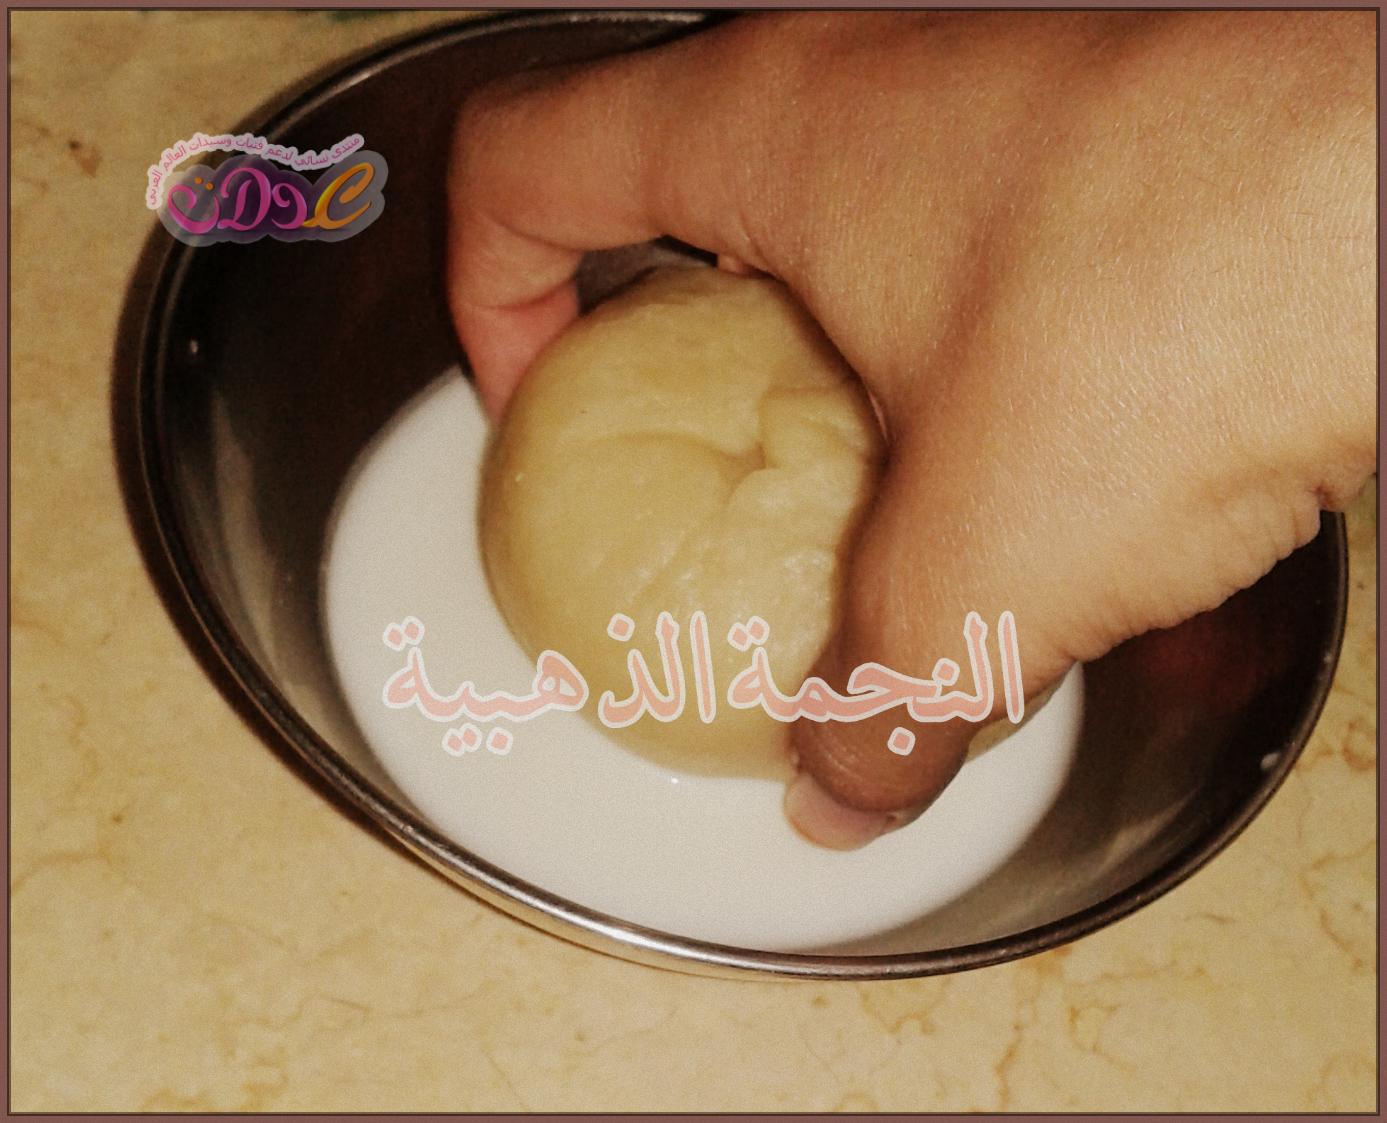 مطبخي] محشوه بالسكر .قرص بالسمسم لذيذه 3dlat.com_07_18_c31f